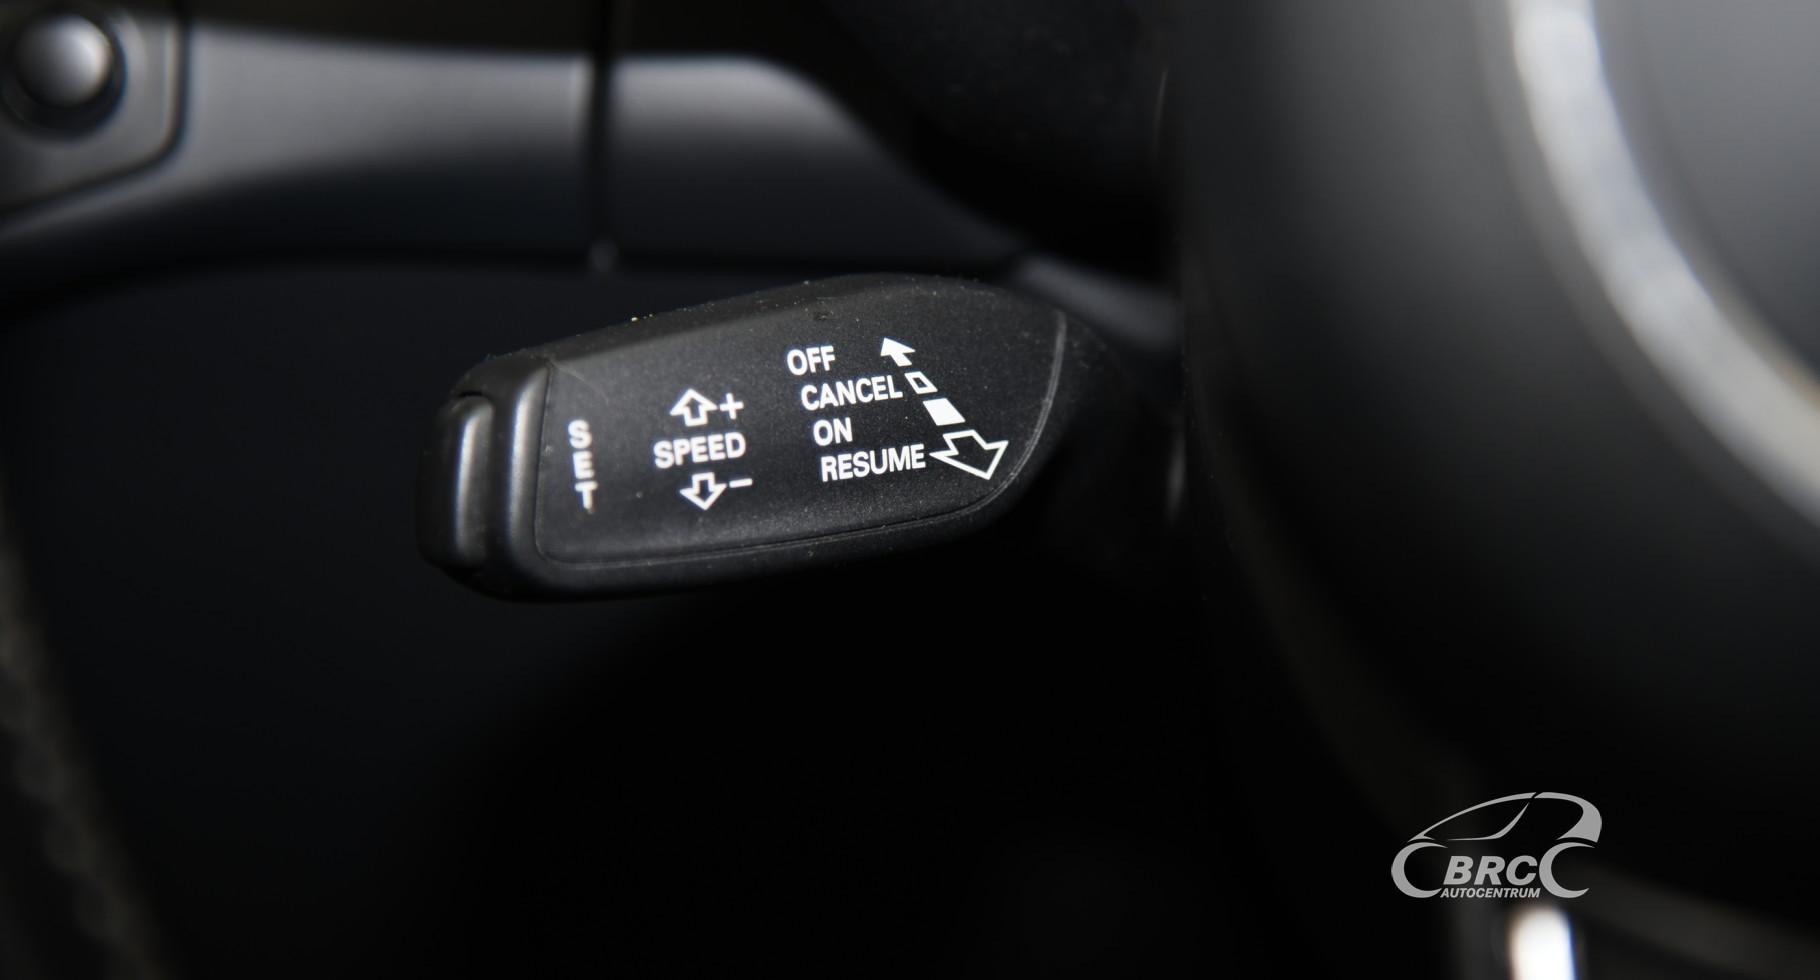 Audi A4 2.0 TDI S-Line Automatas